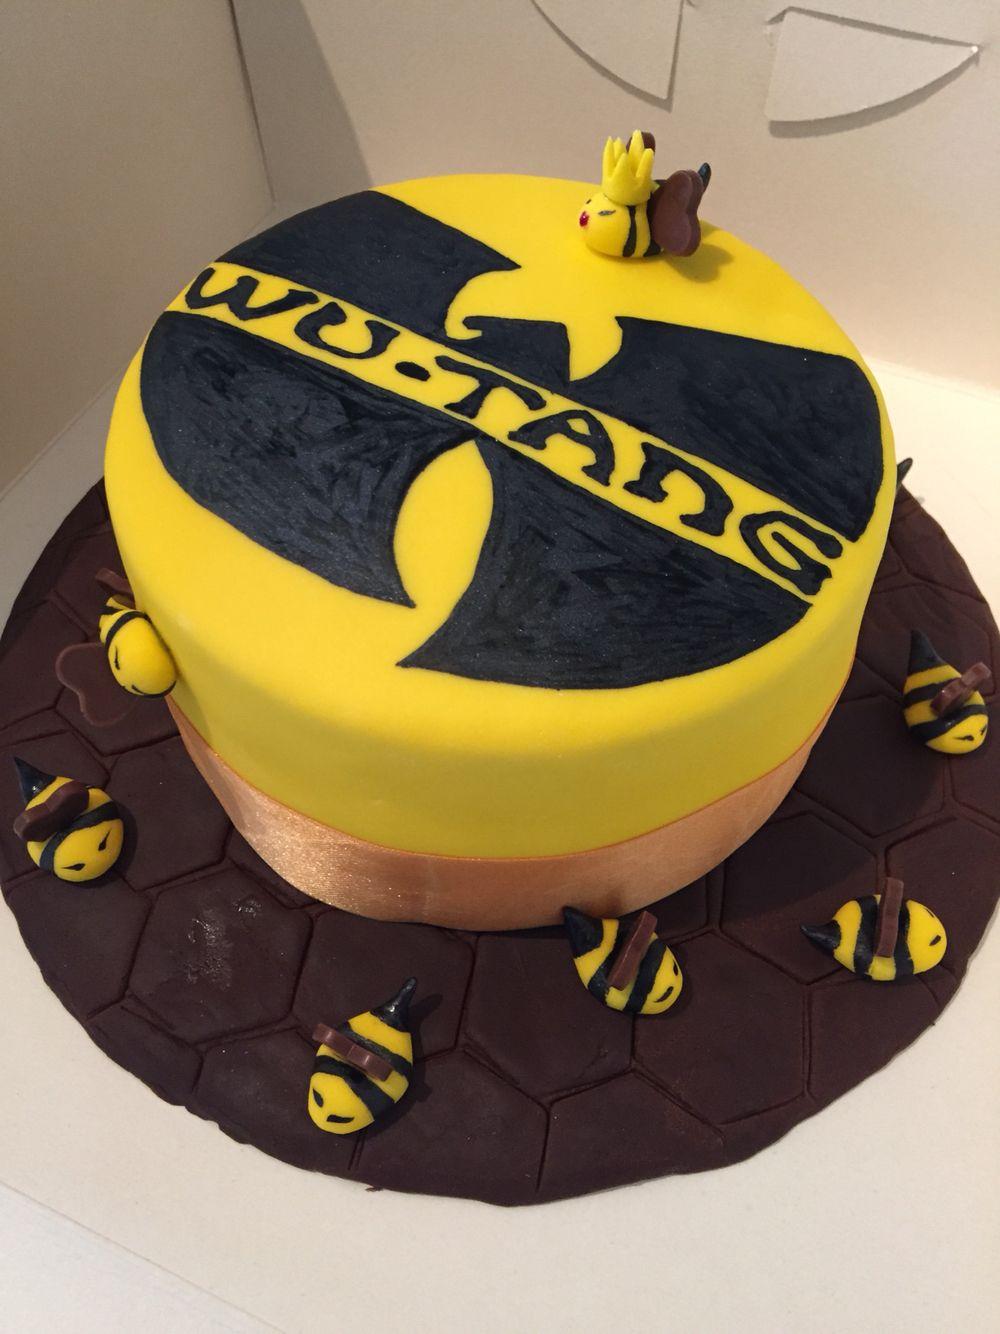 Wu tang clan cake the swarm cakes pinterest wu tang clan and wu tang clan cake the swarm pooptronica